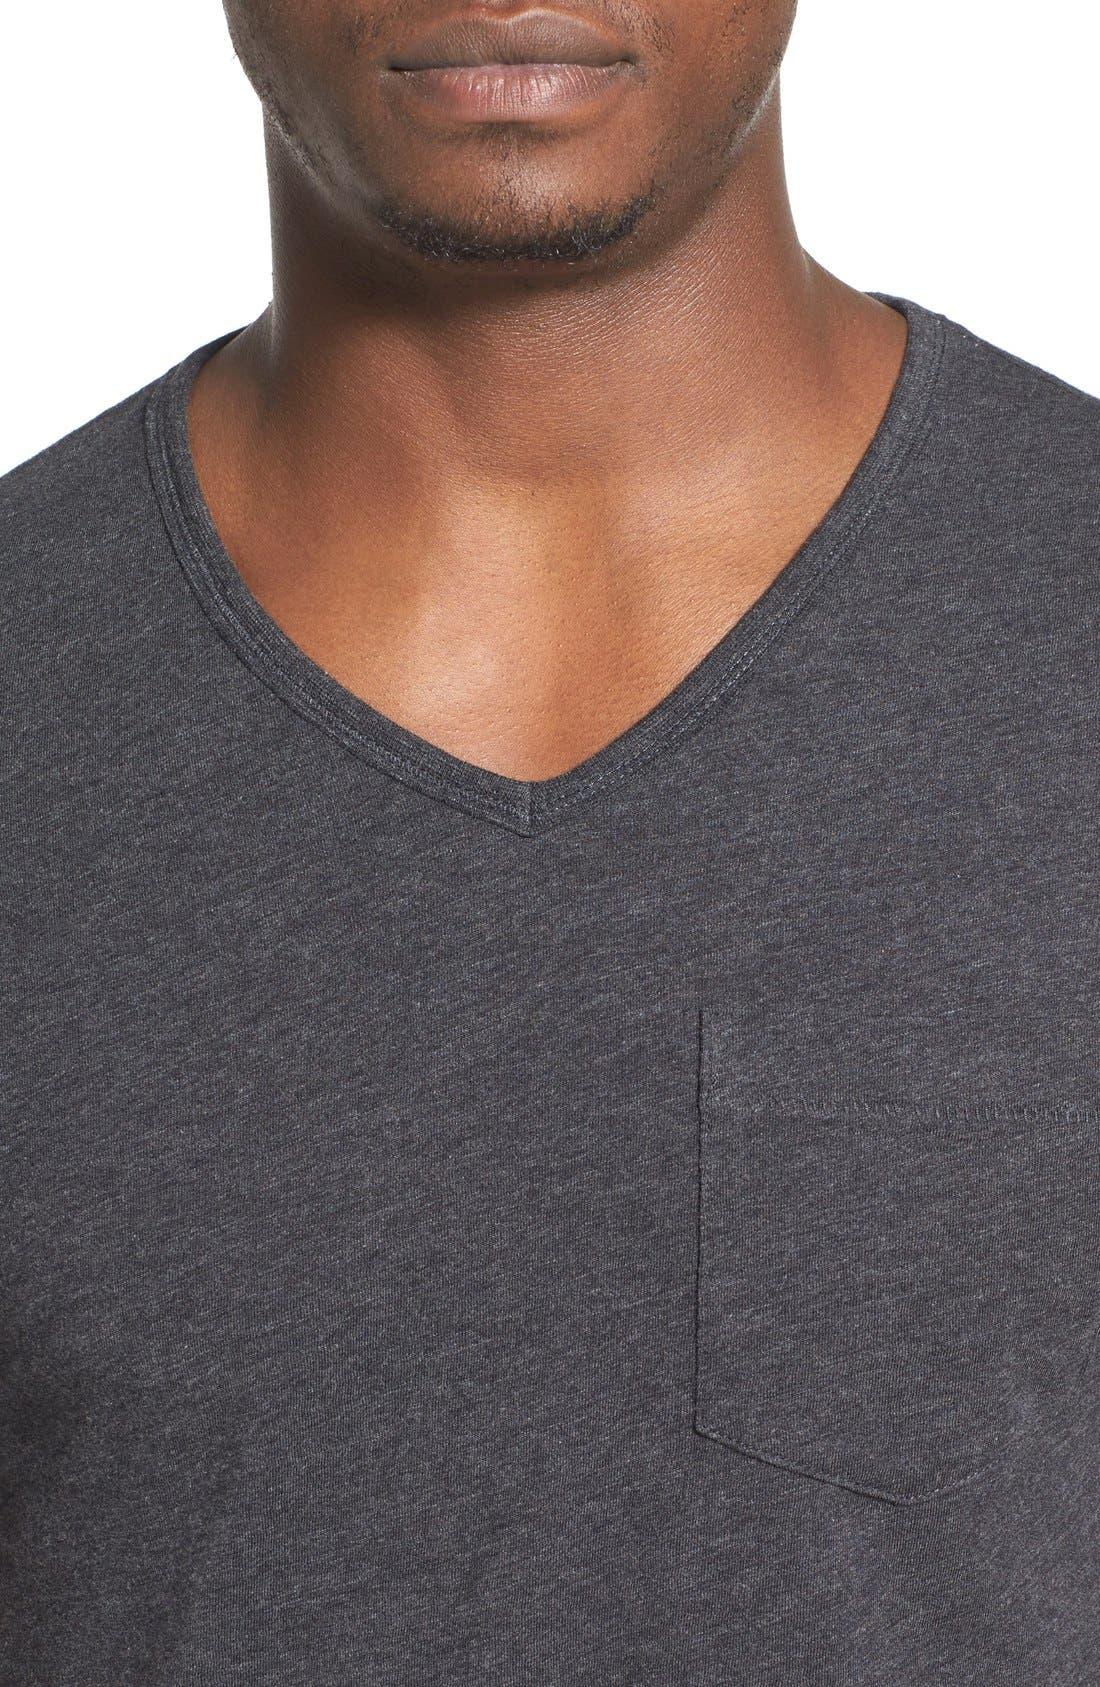 'Bing' V-Neck Pocket T-Shirt,                             Alternate thumbnail 4, color,                             Dark Charcoal Heather